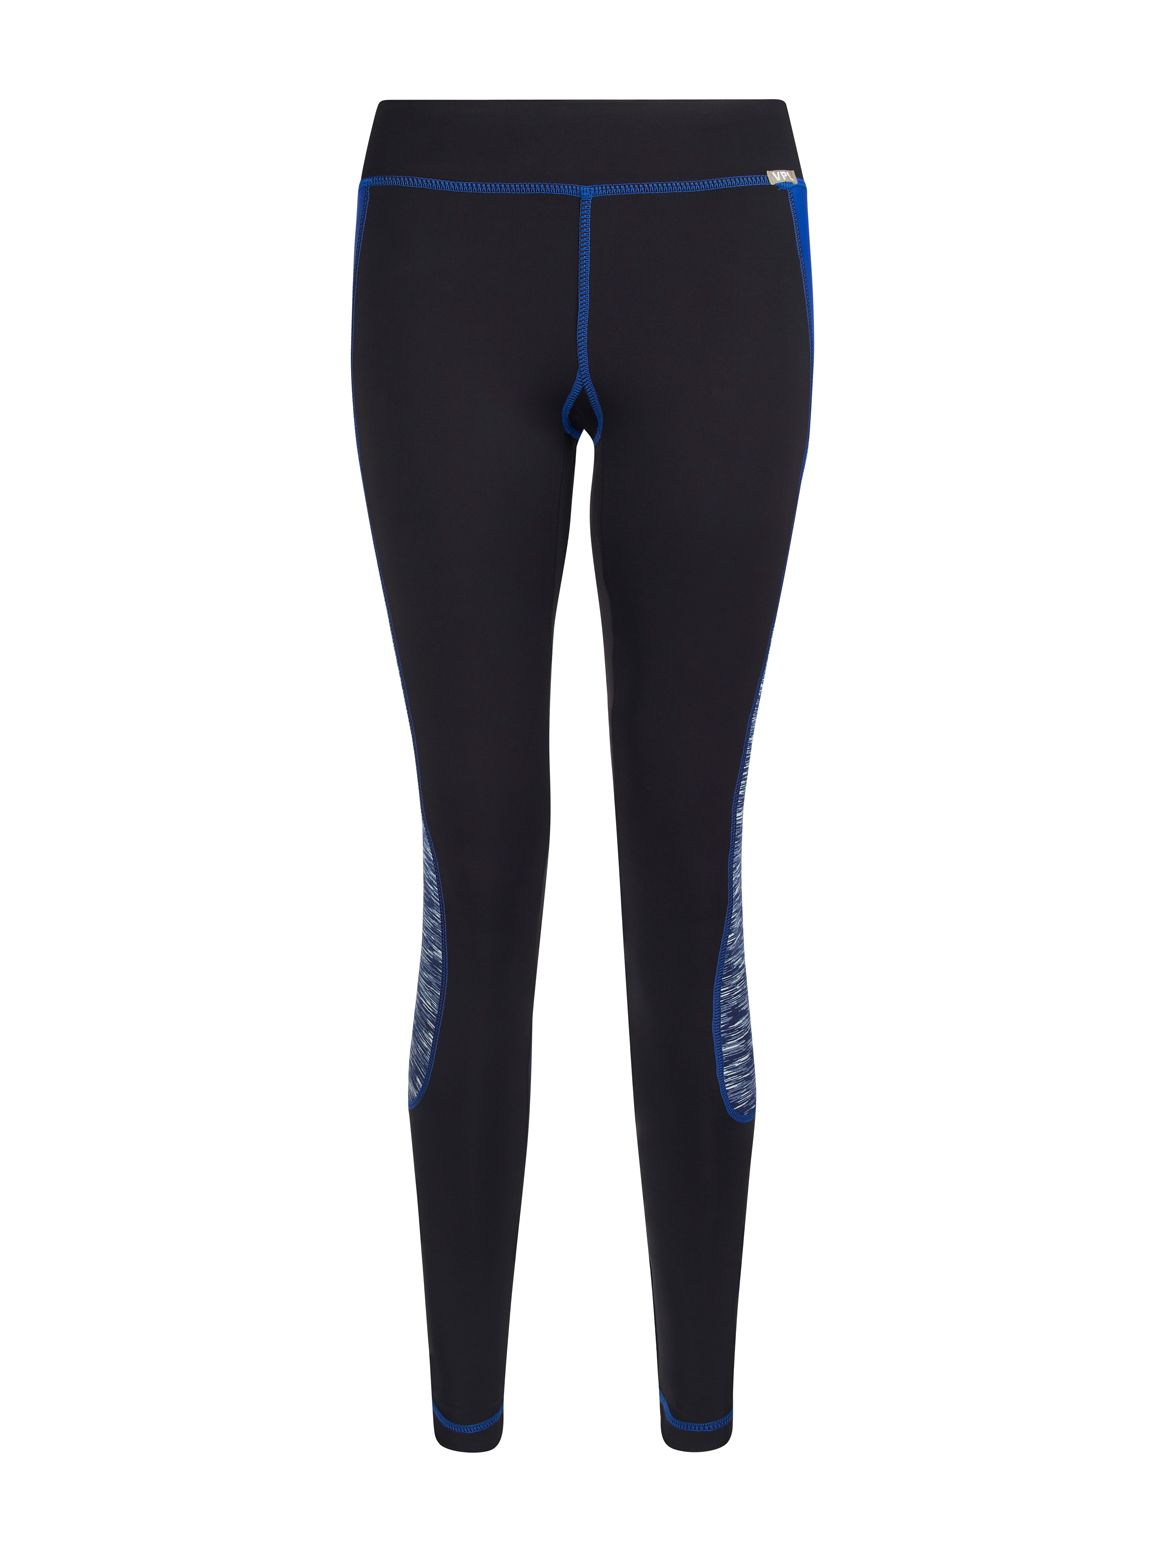 VPL Spacedye Navy X-Curvate leggings from Fashercise